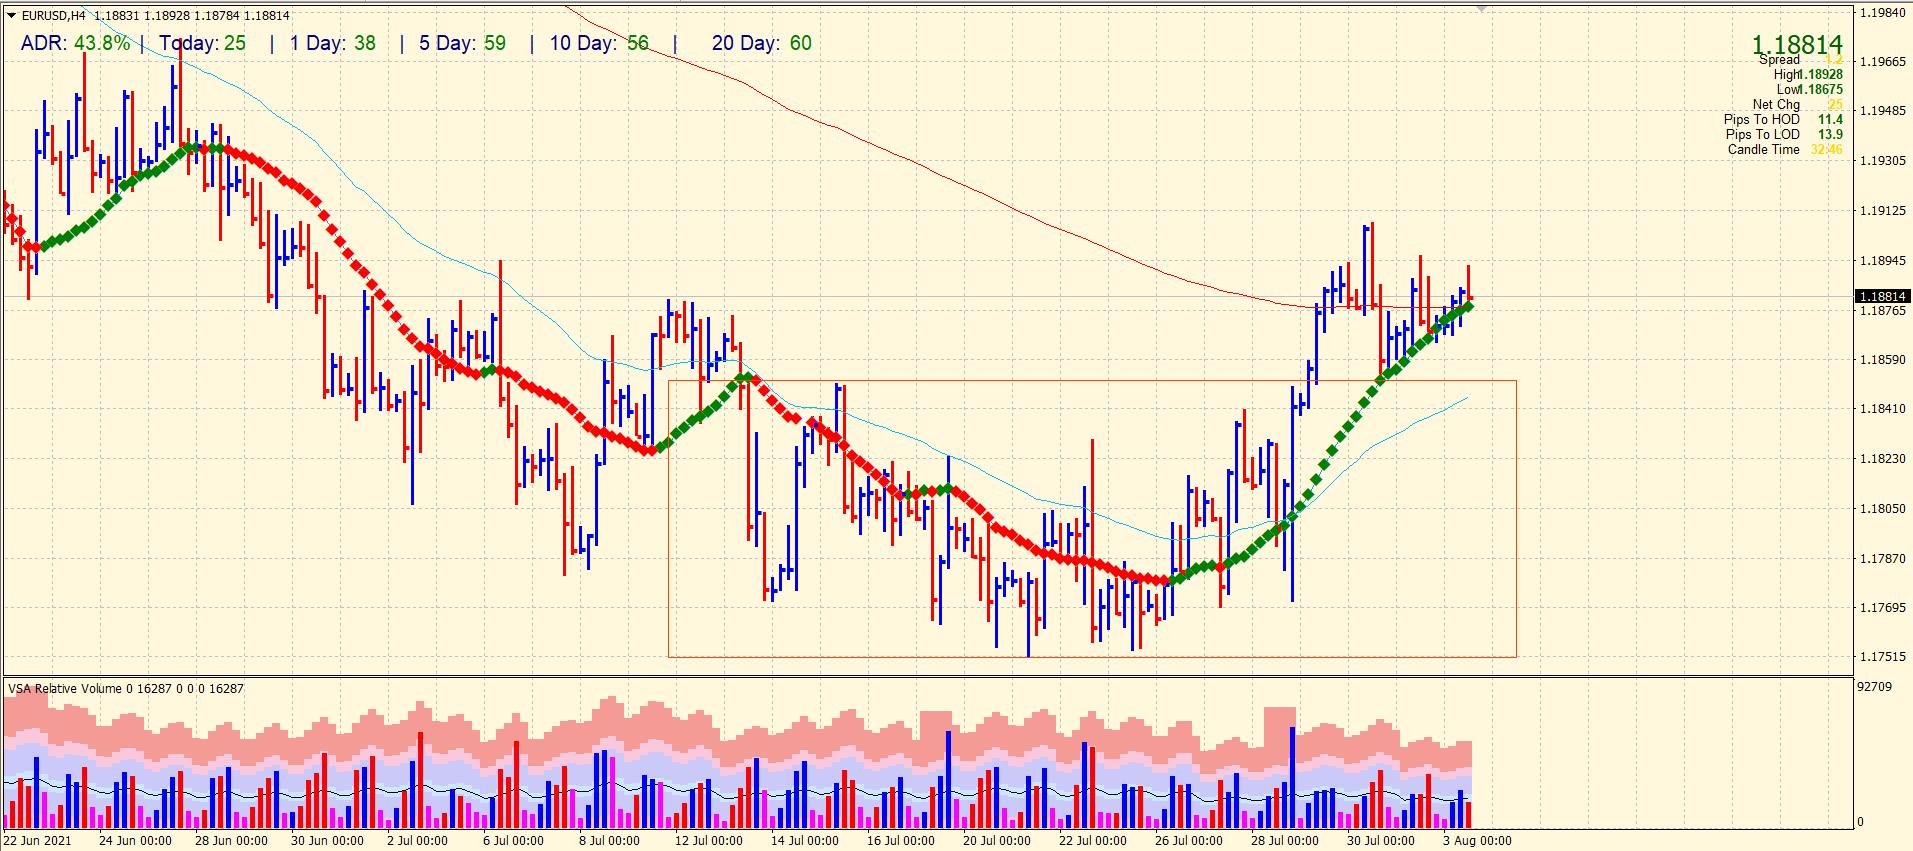 EUR/USD 4-hour chart analysis